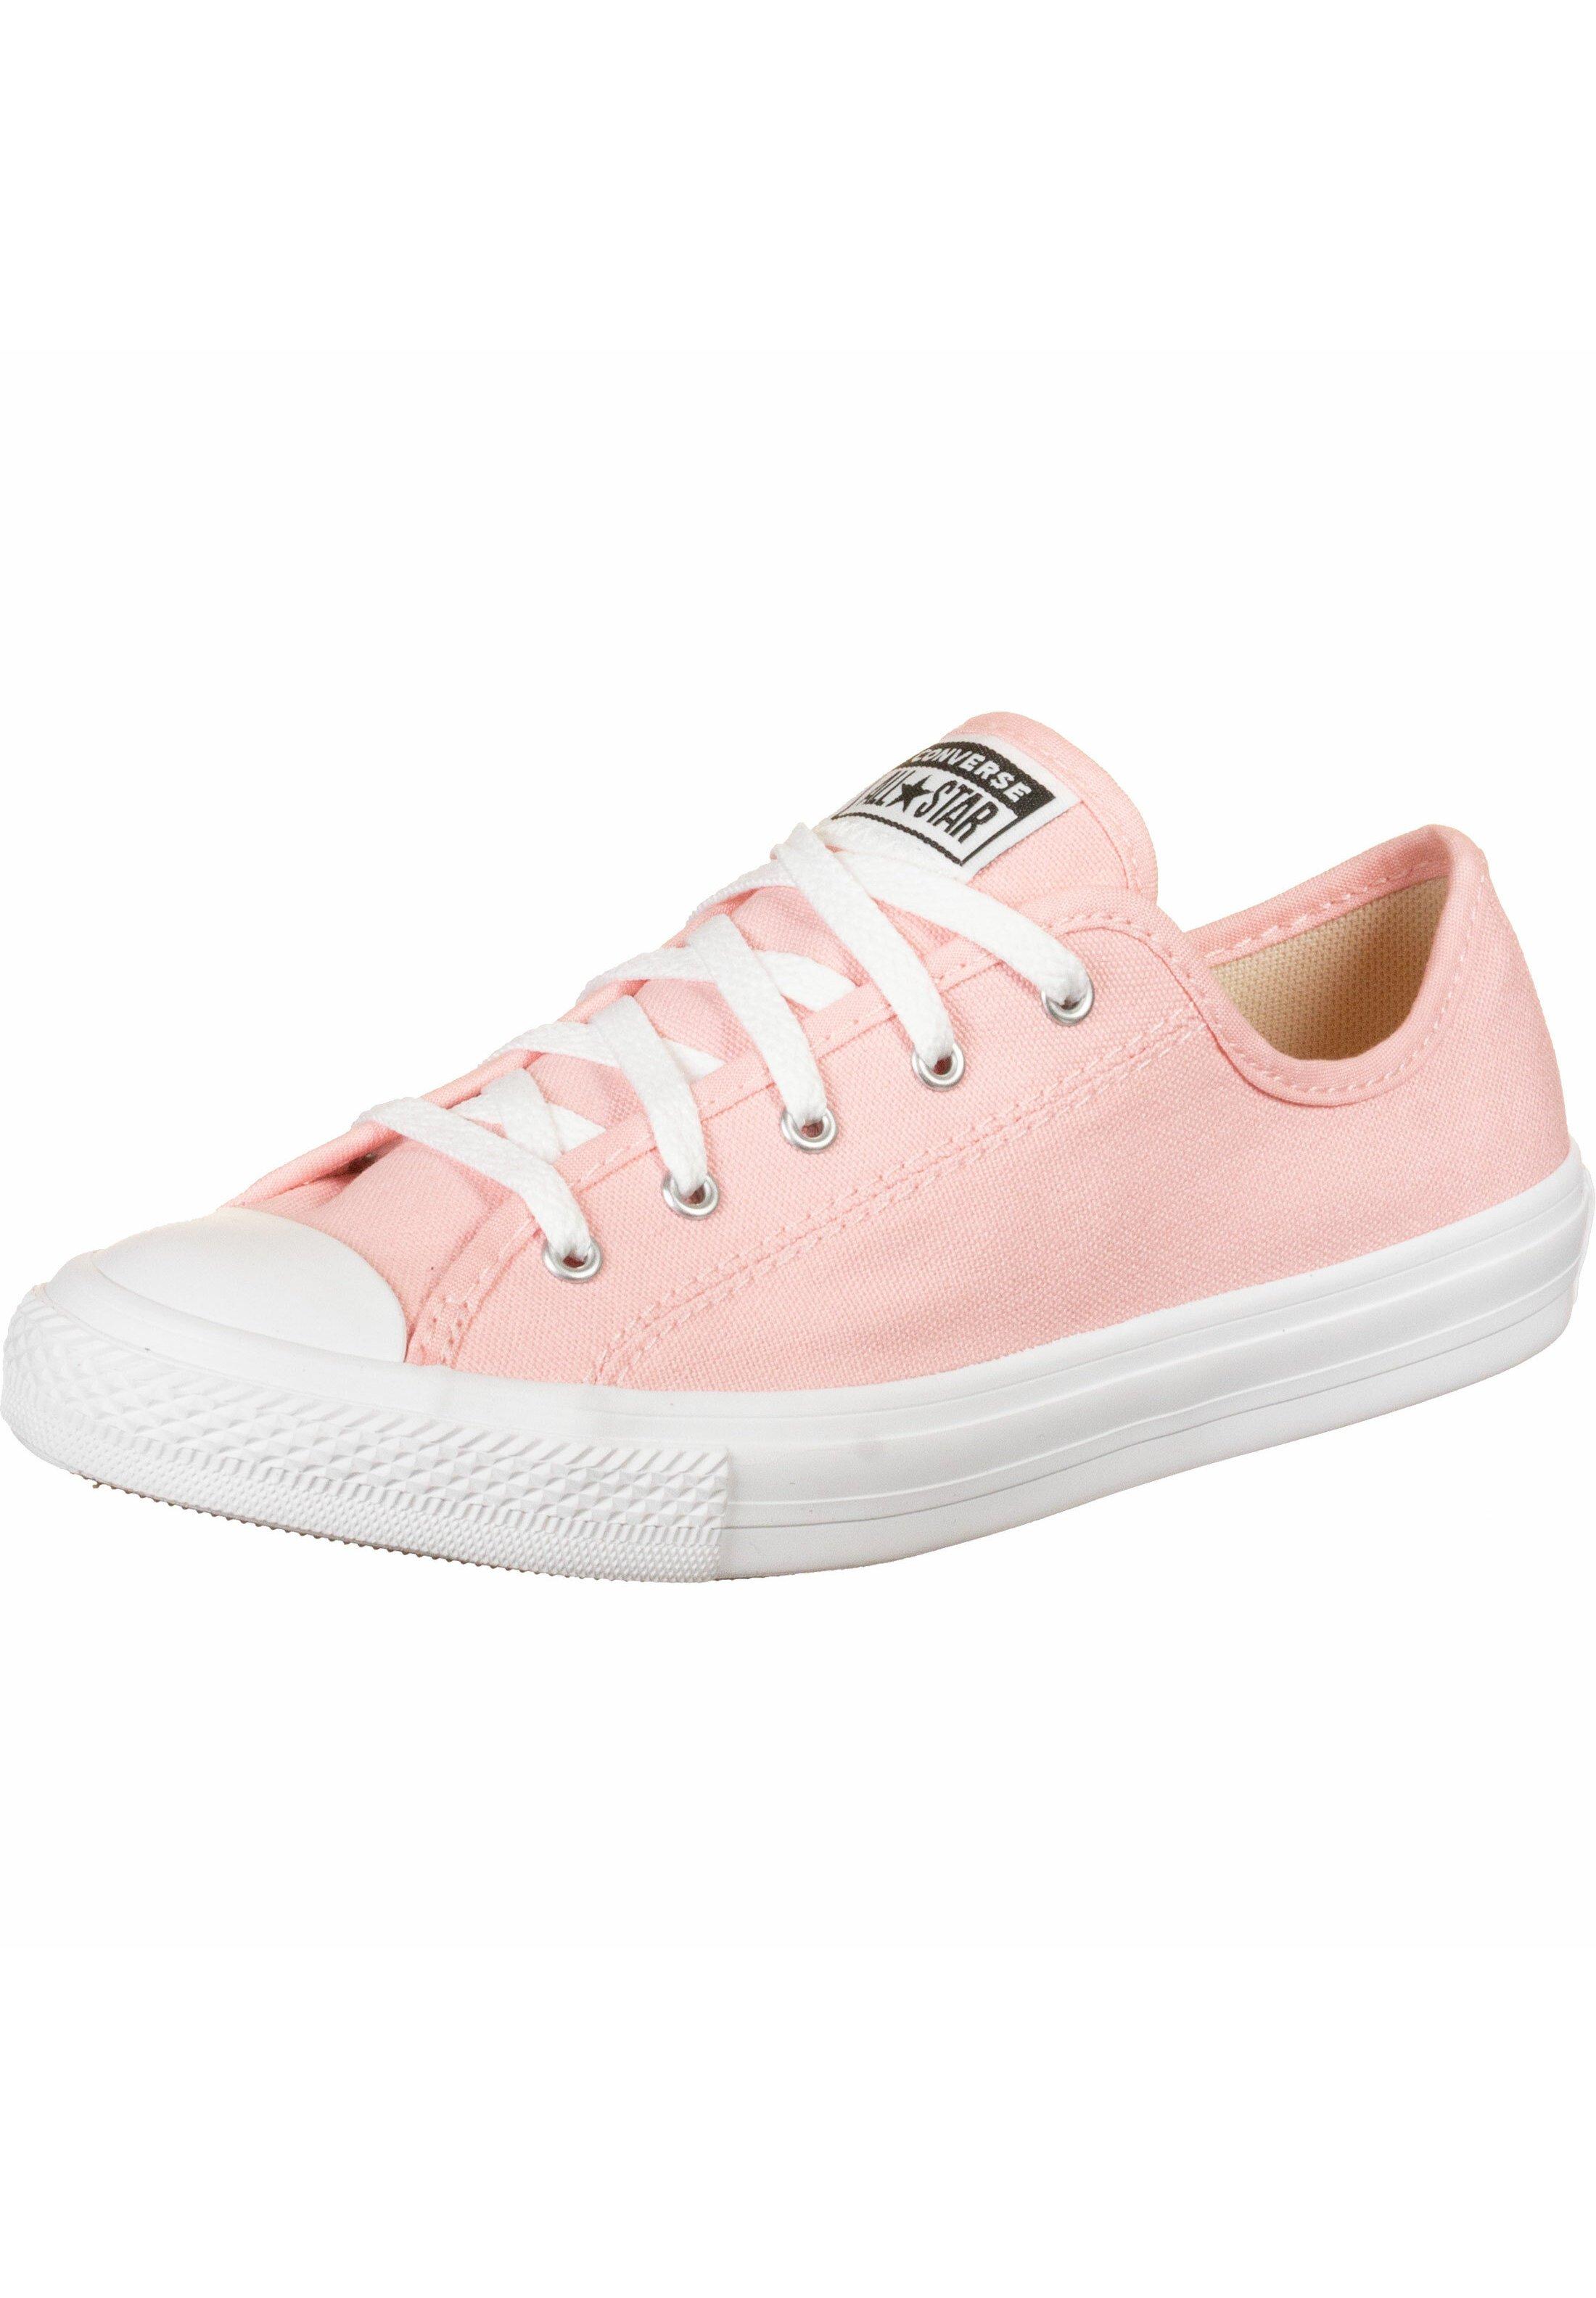 Converse CHUCK TAYLOR ALL STAR DAINTY SEASONAL Sneaker low